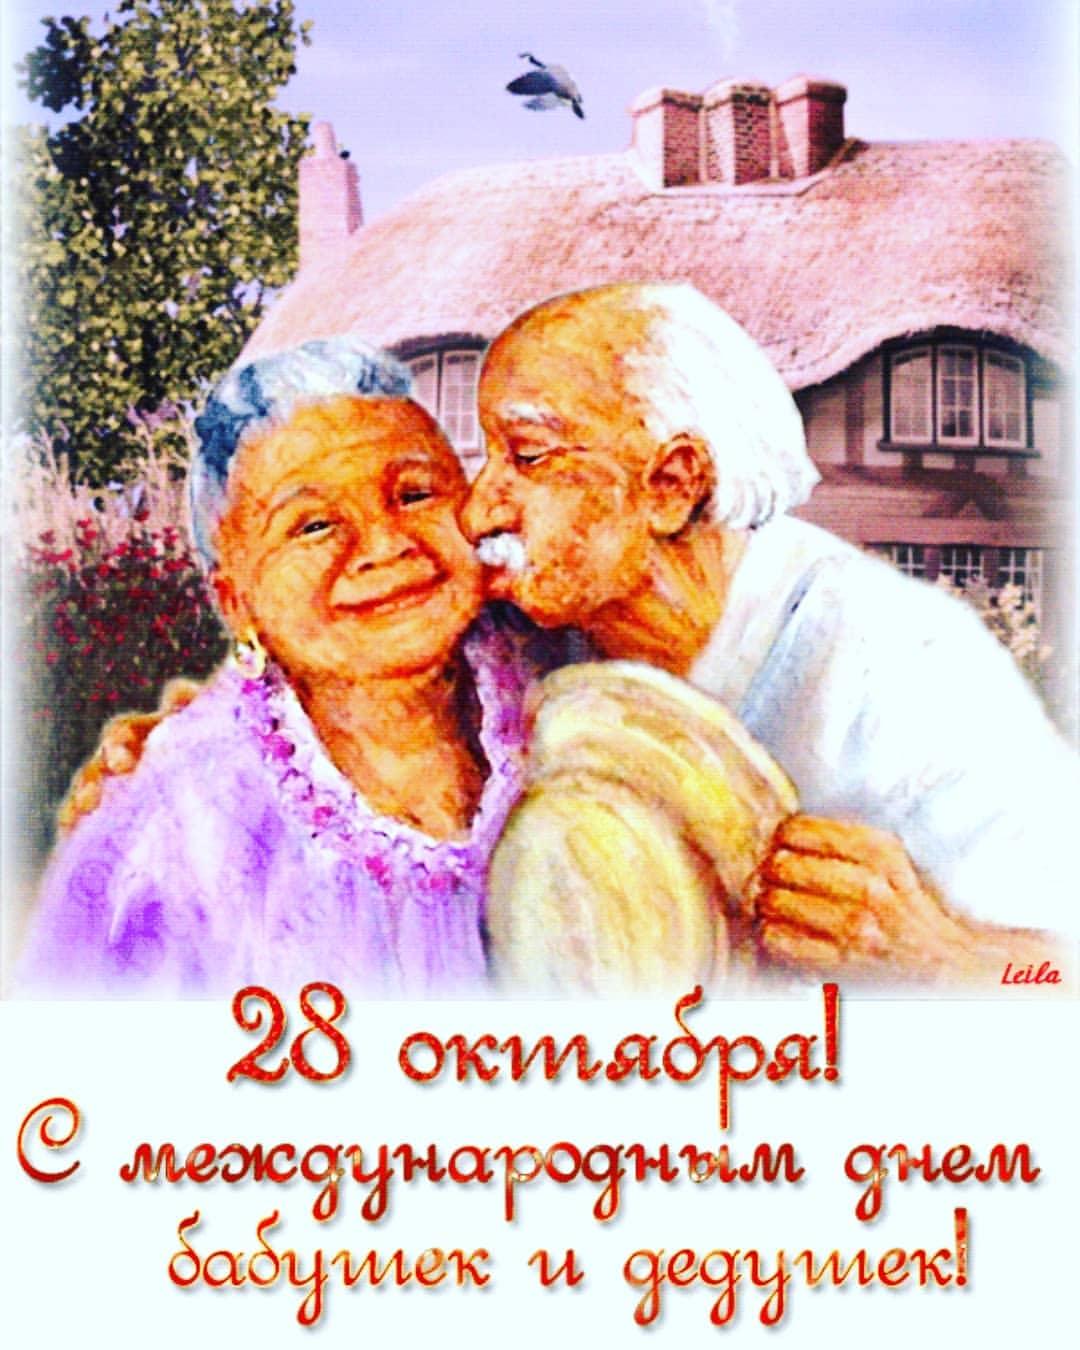 Открытки с днем бабушек и дедушек картинки